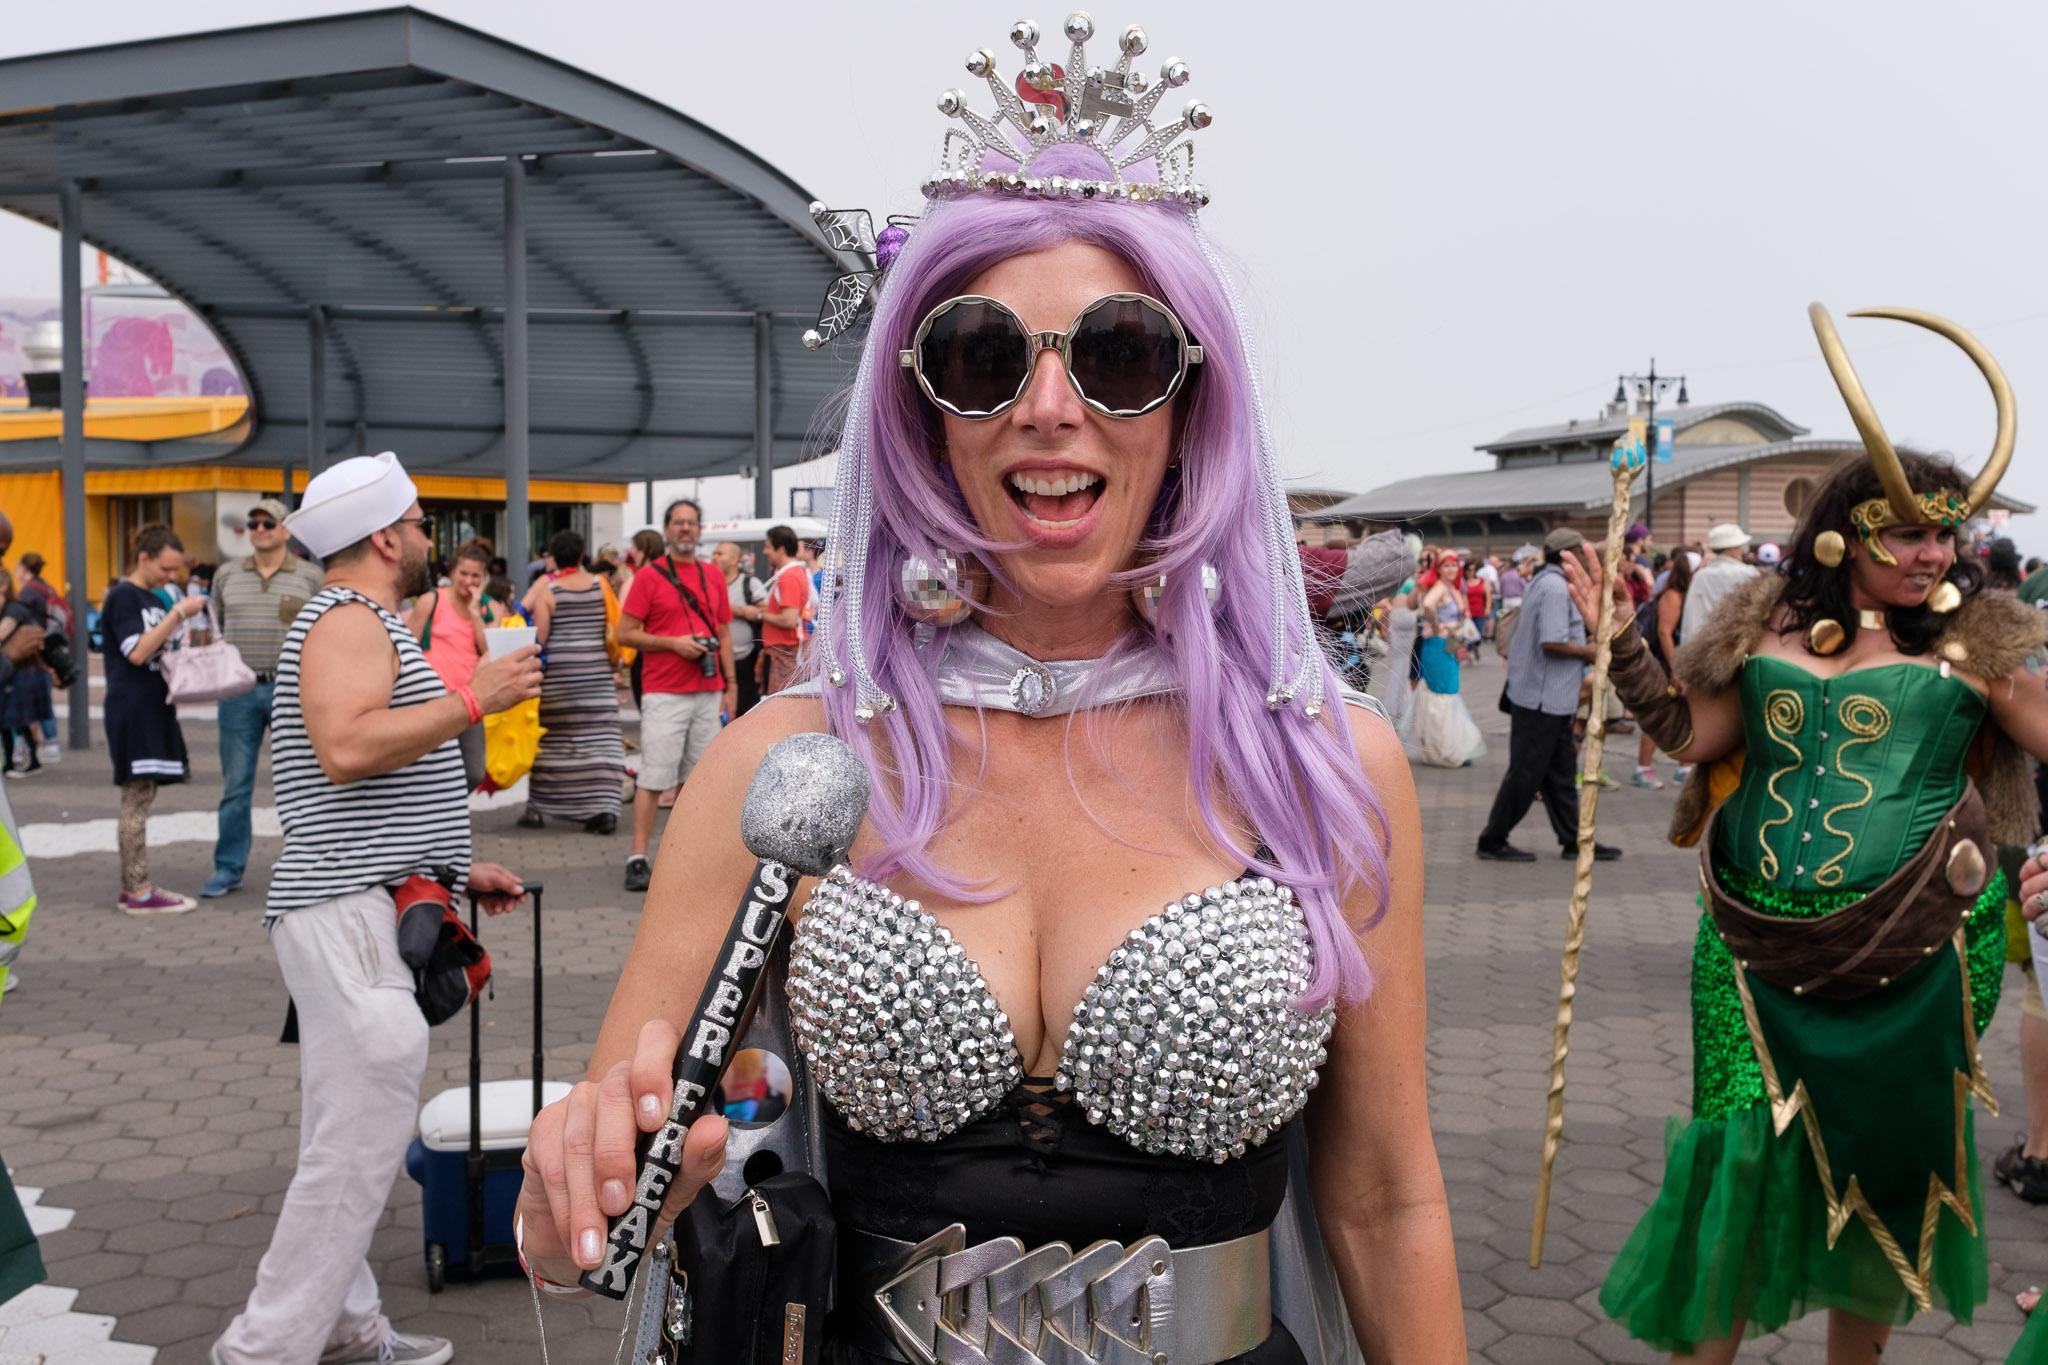 mermaidparade2017_023.jpg